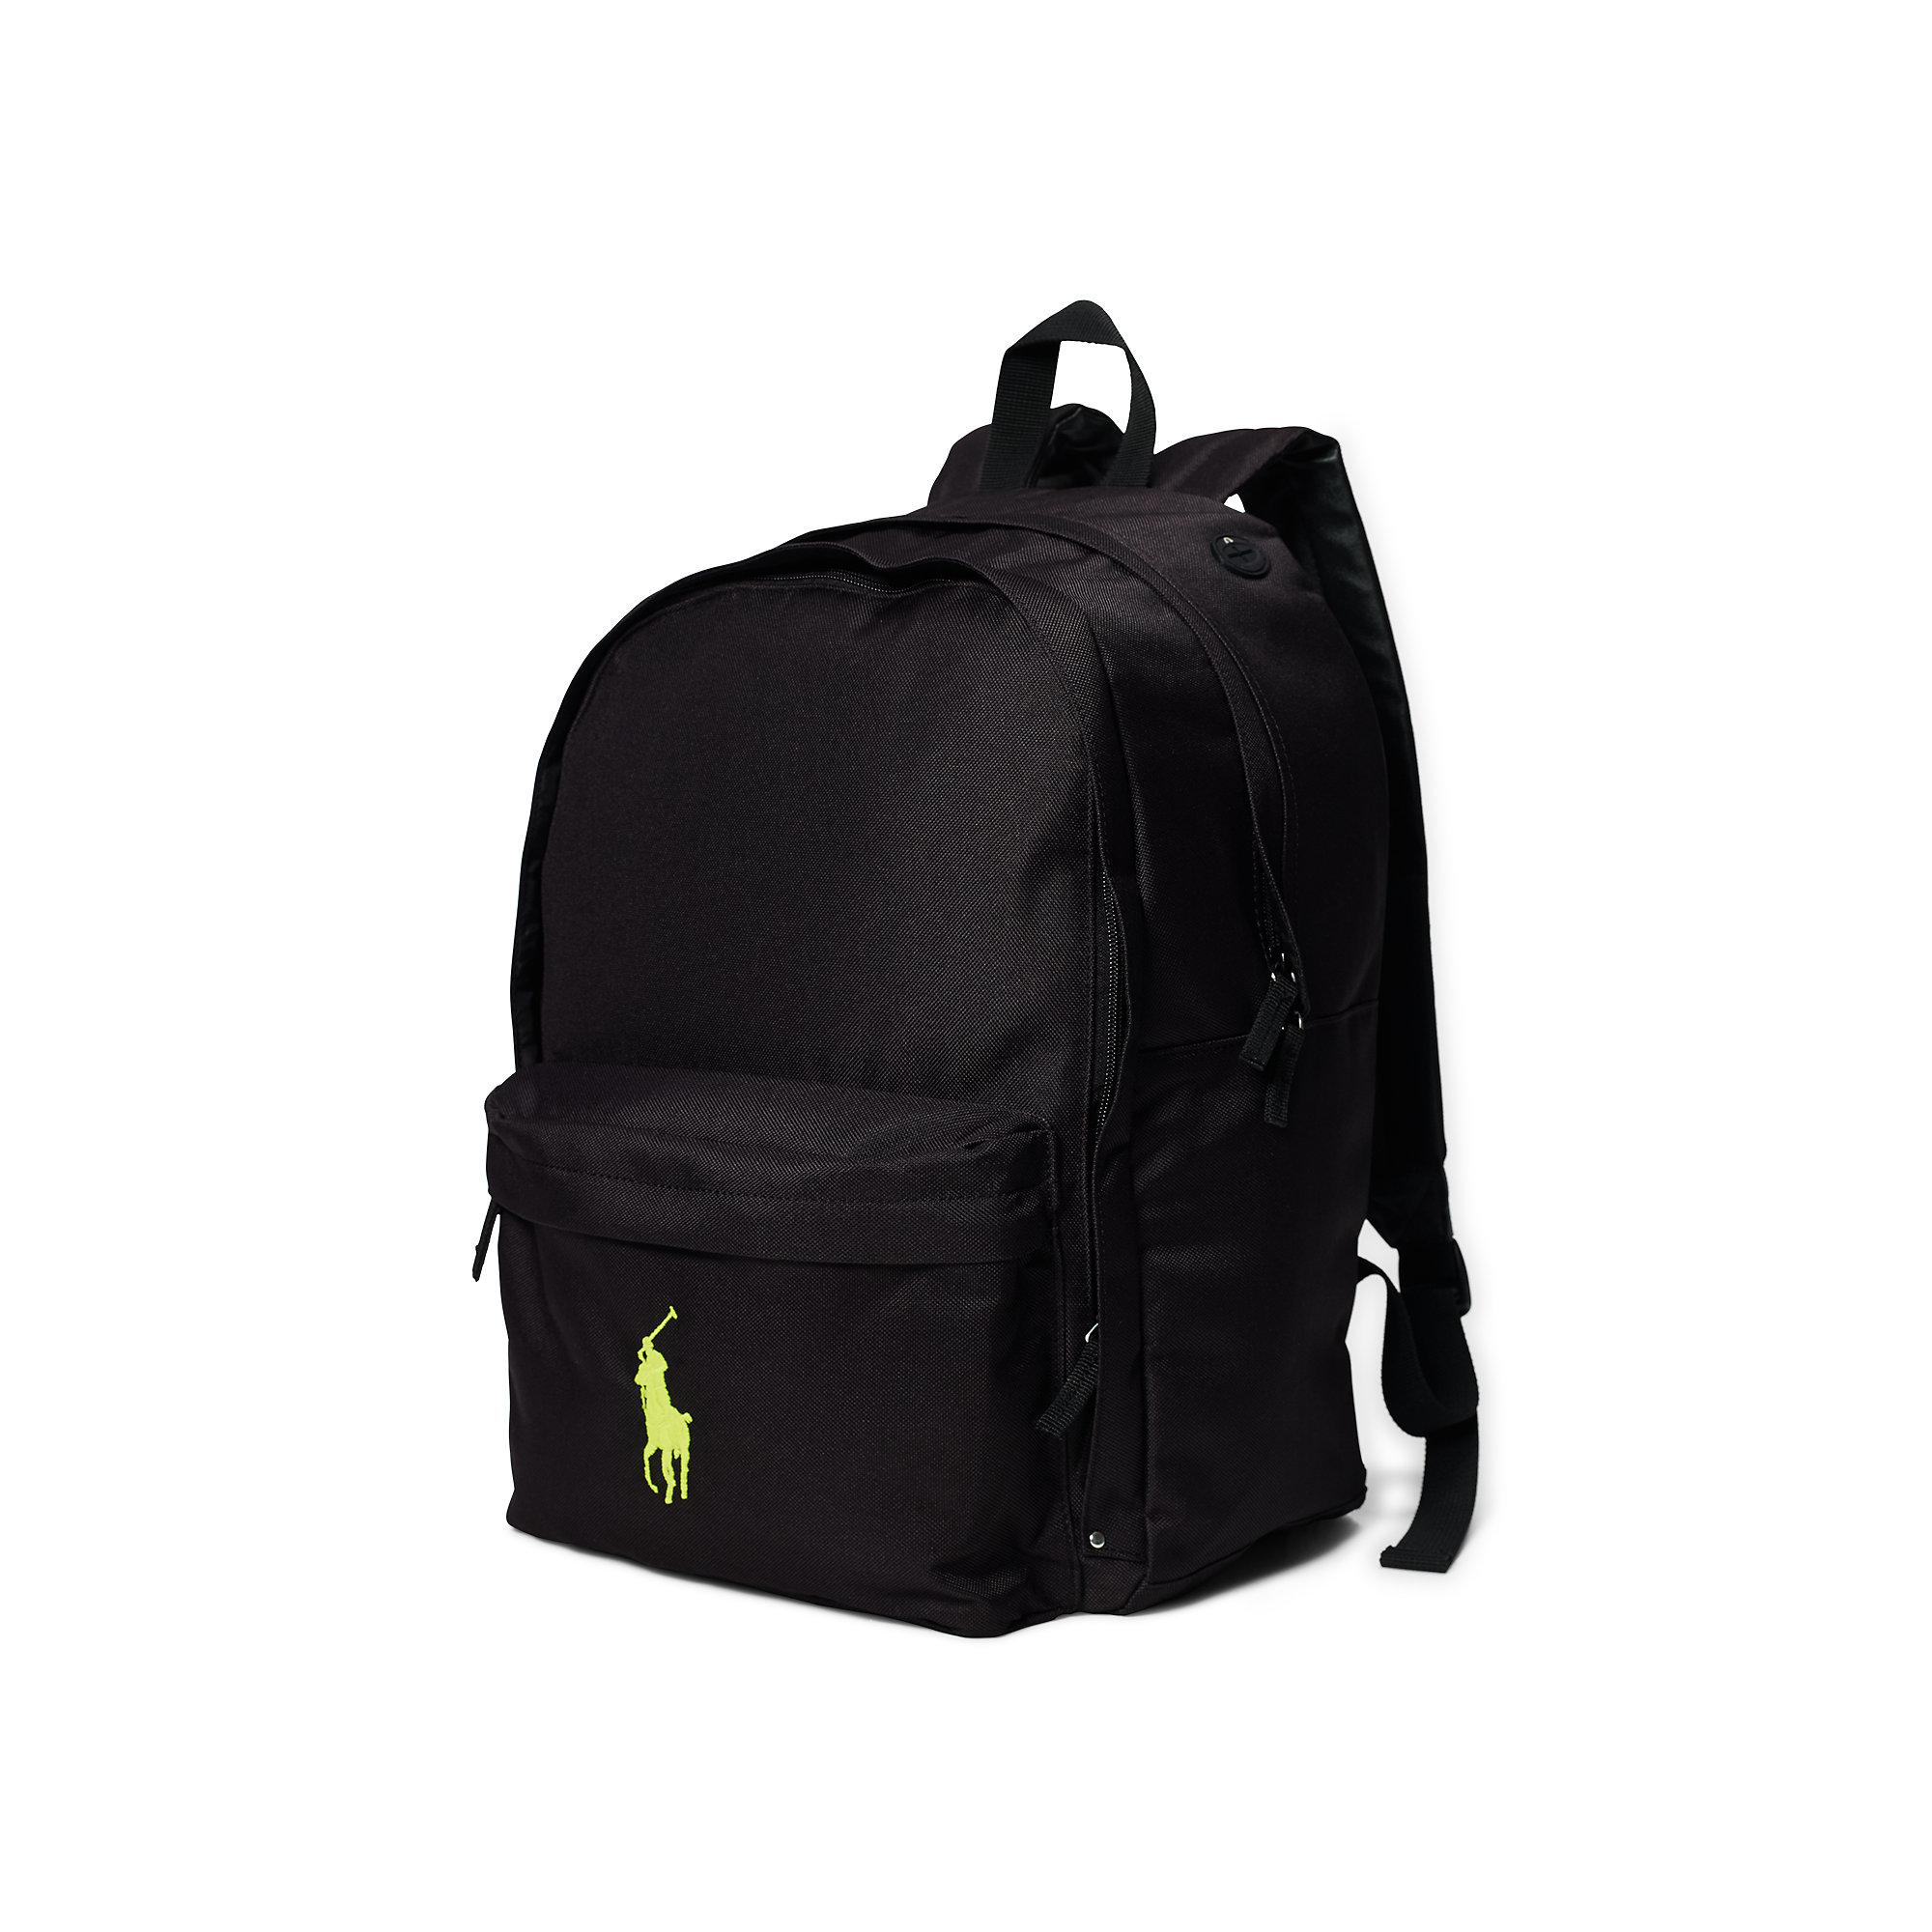 625ed5015e0f7 Lyst - Ralph Lauren Large Big Pony Backpack in Black